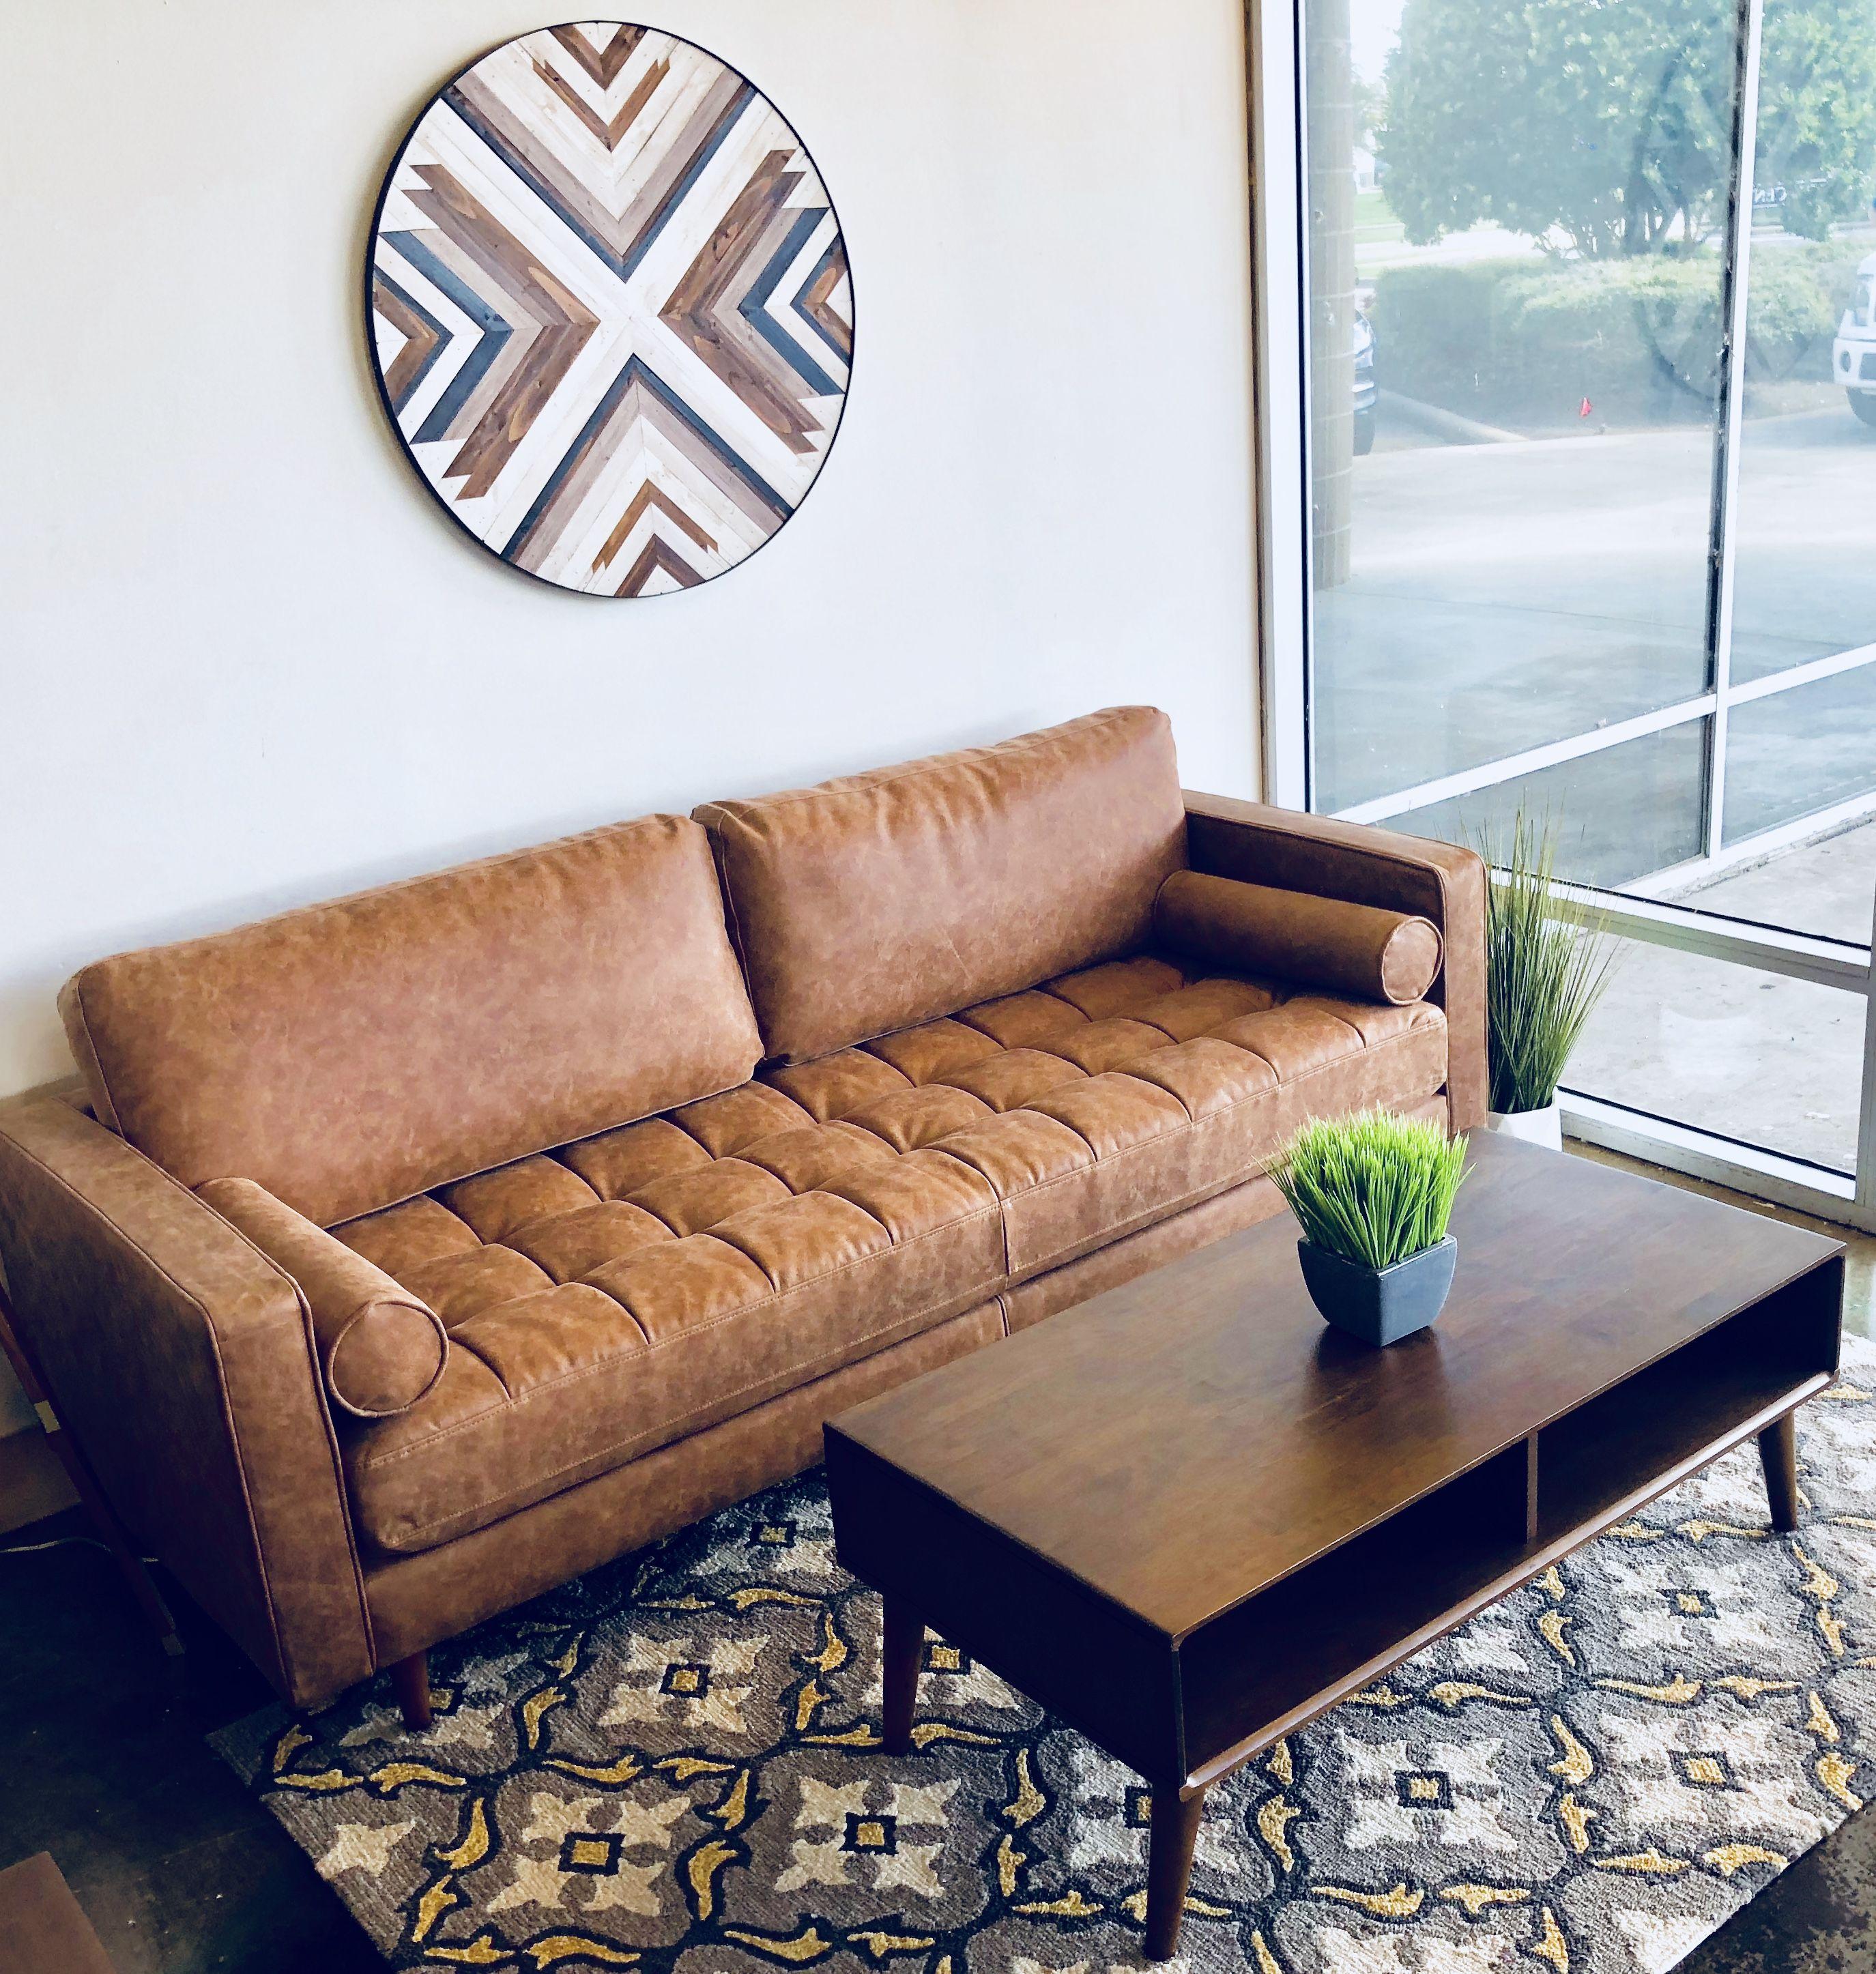 Mid Century Modern Leather Sofa In Katy Texas By Midinmod ...